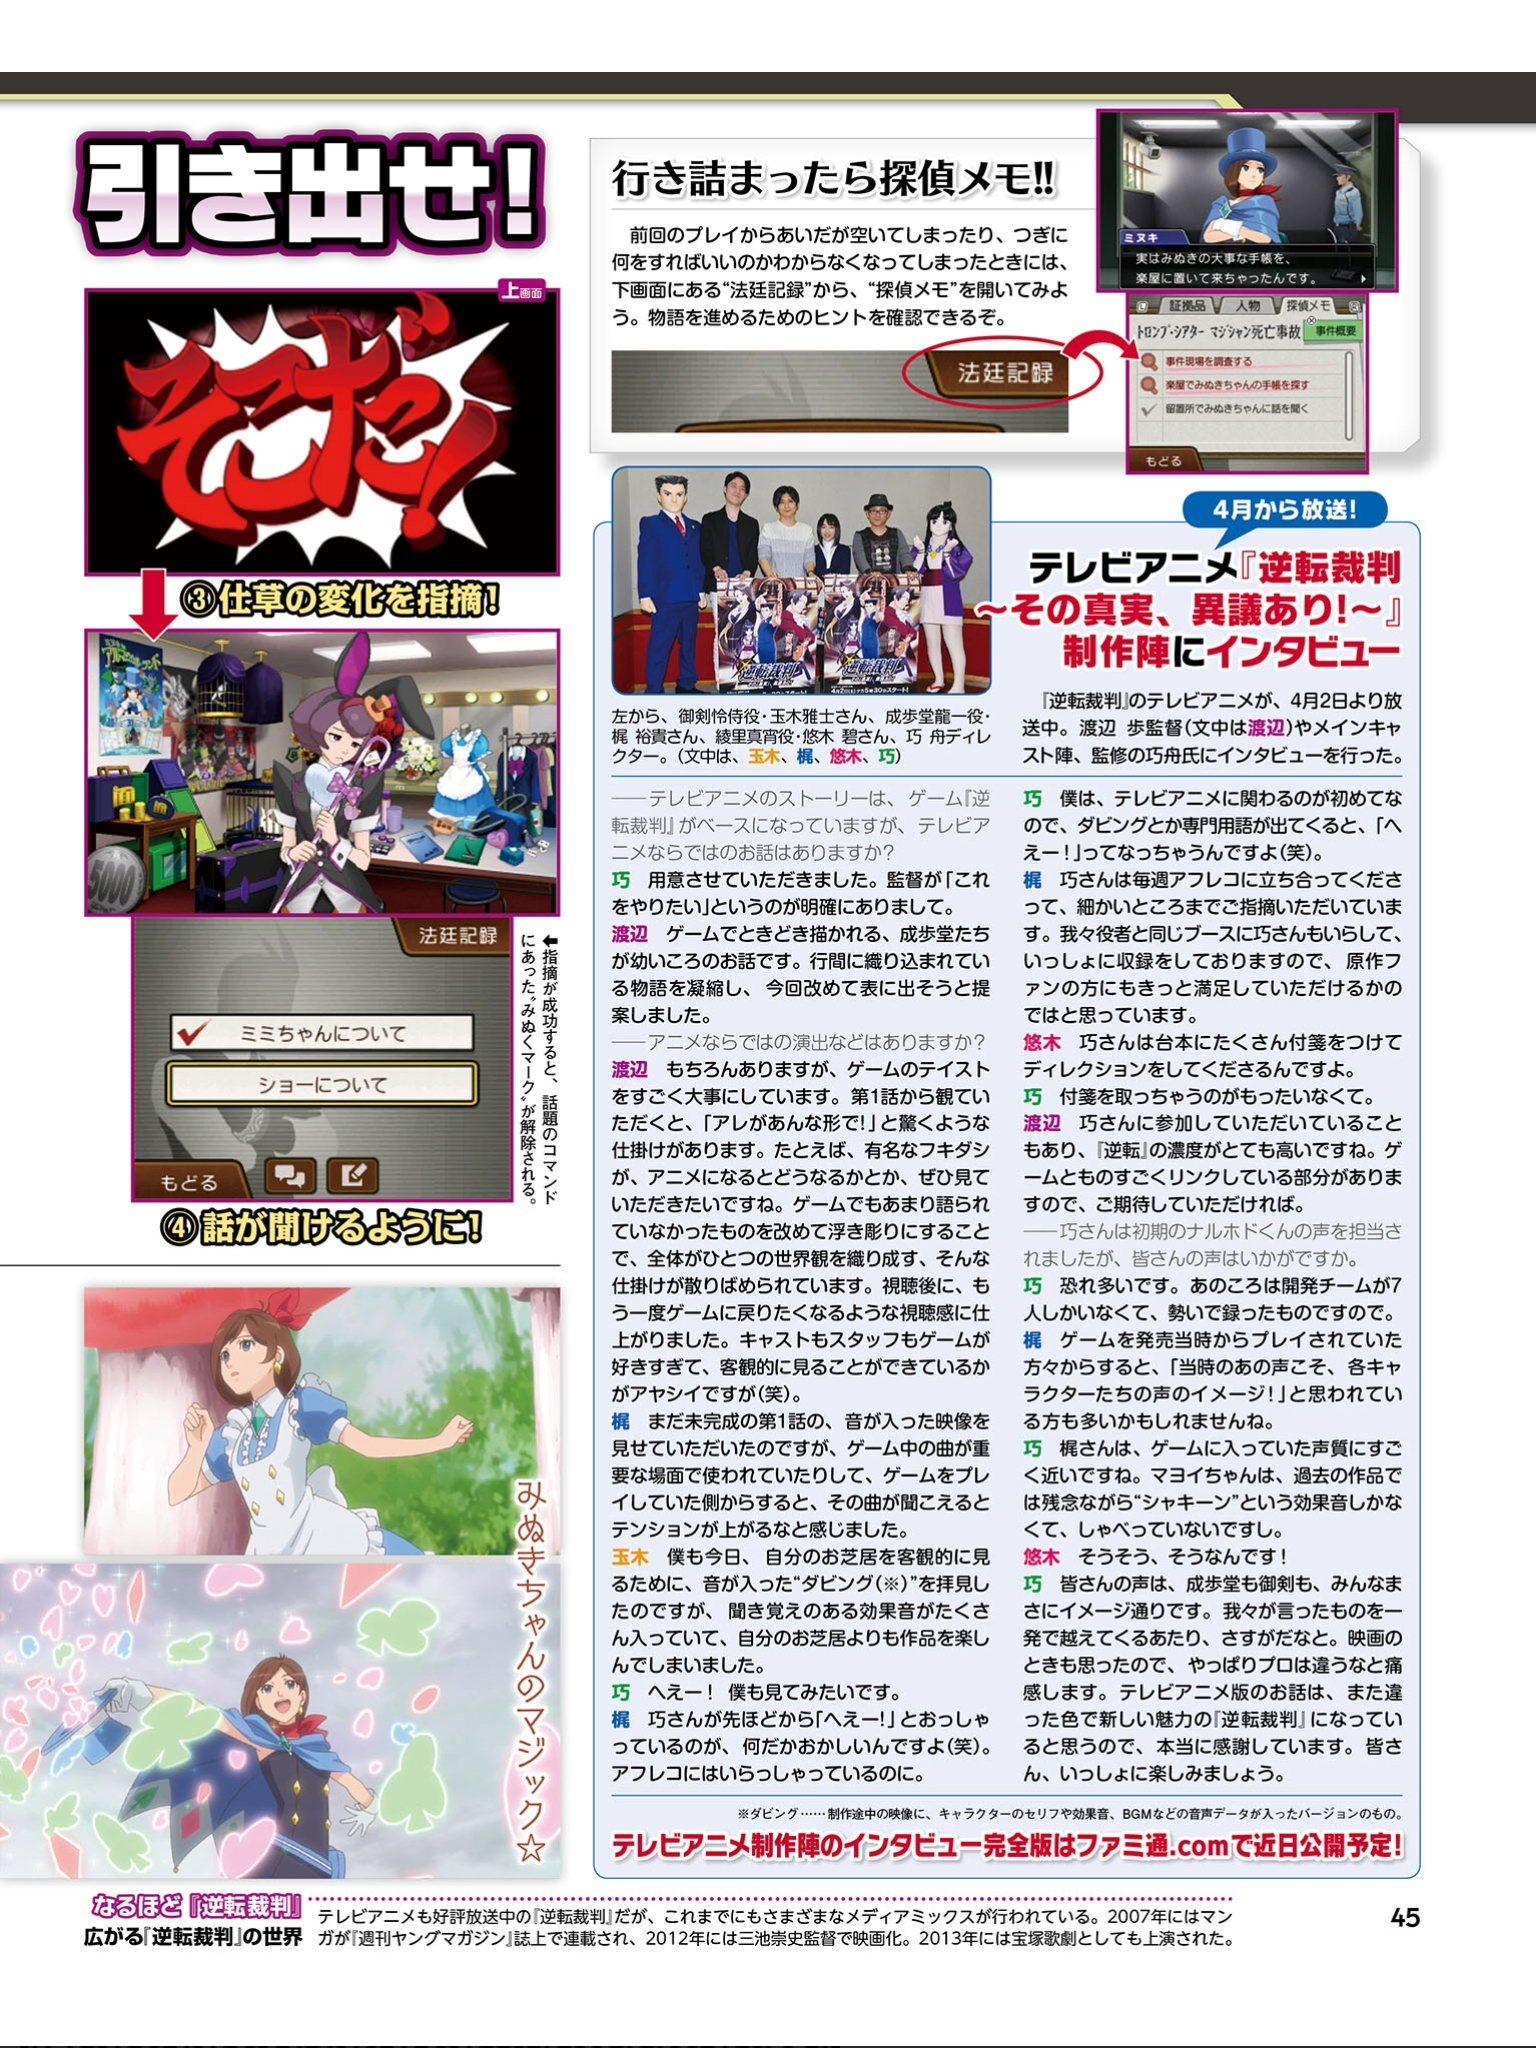 Fami通公布《逆转裁判6》大量新情报